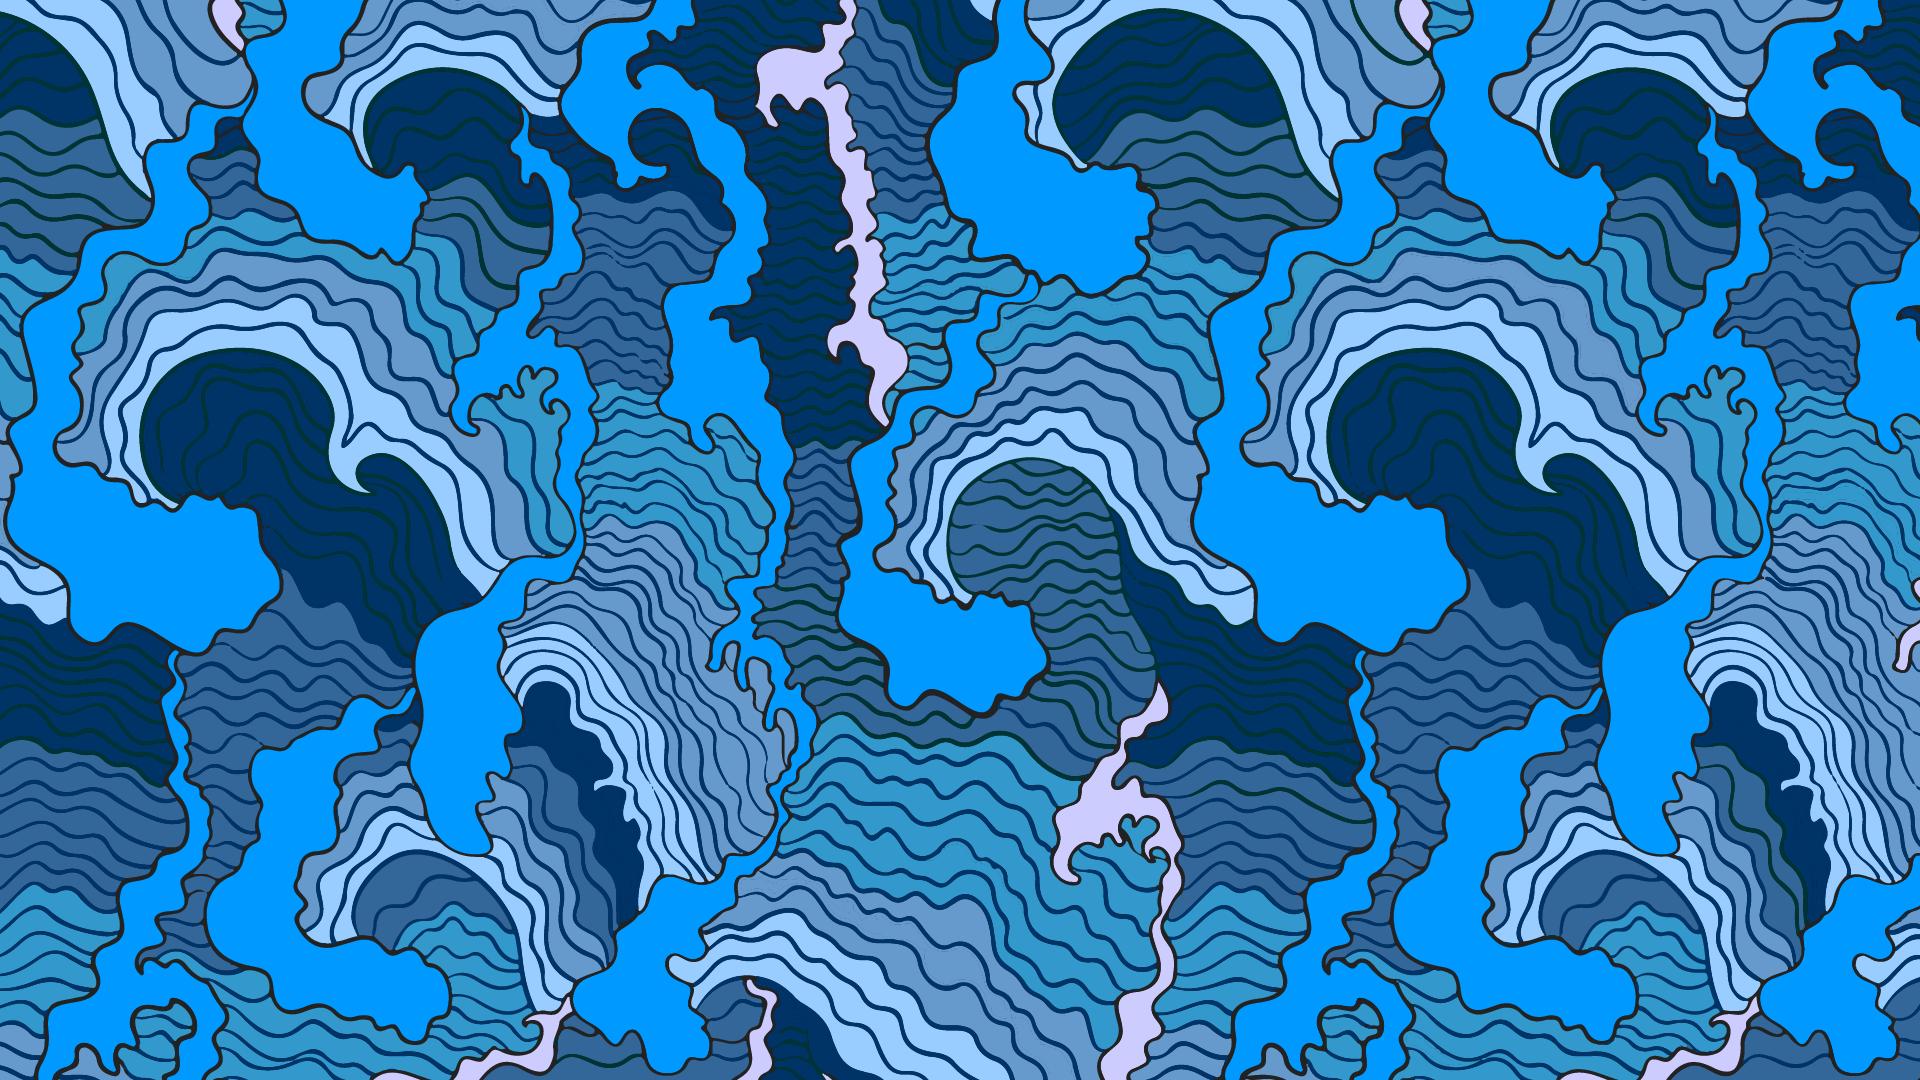 Cool Laptop Wallpaper 1080p Blue Heroscreen Cool Wallpapers